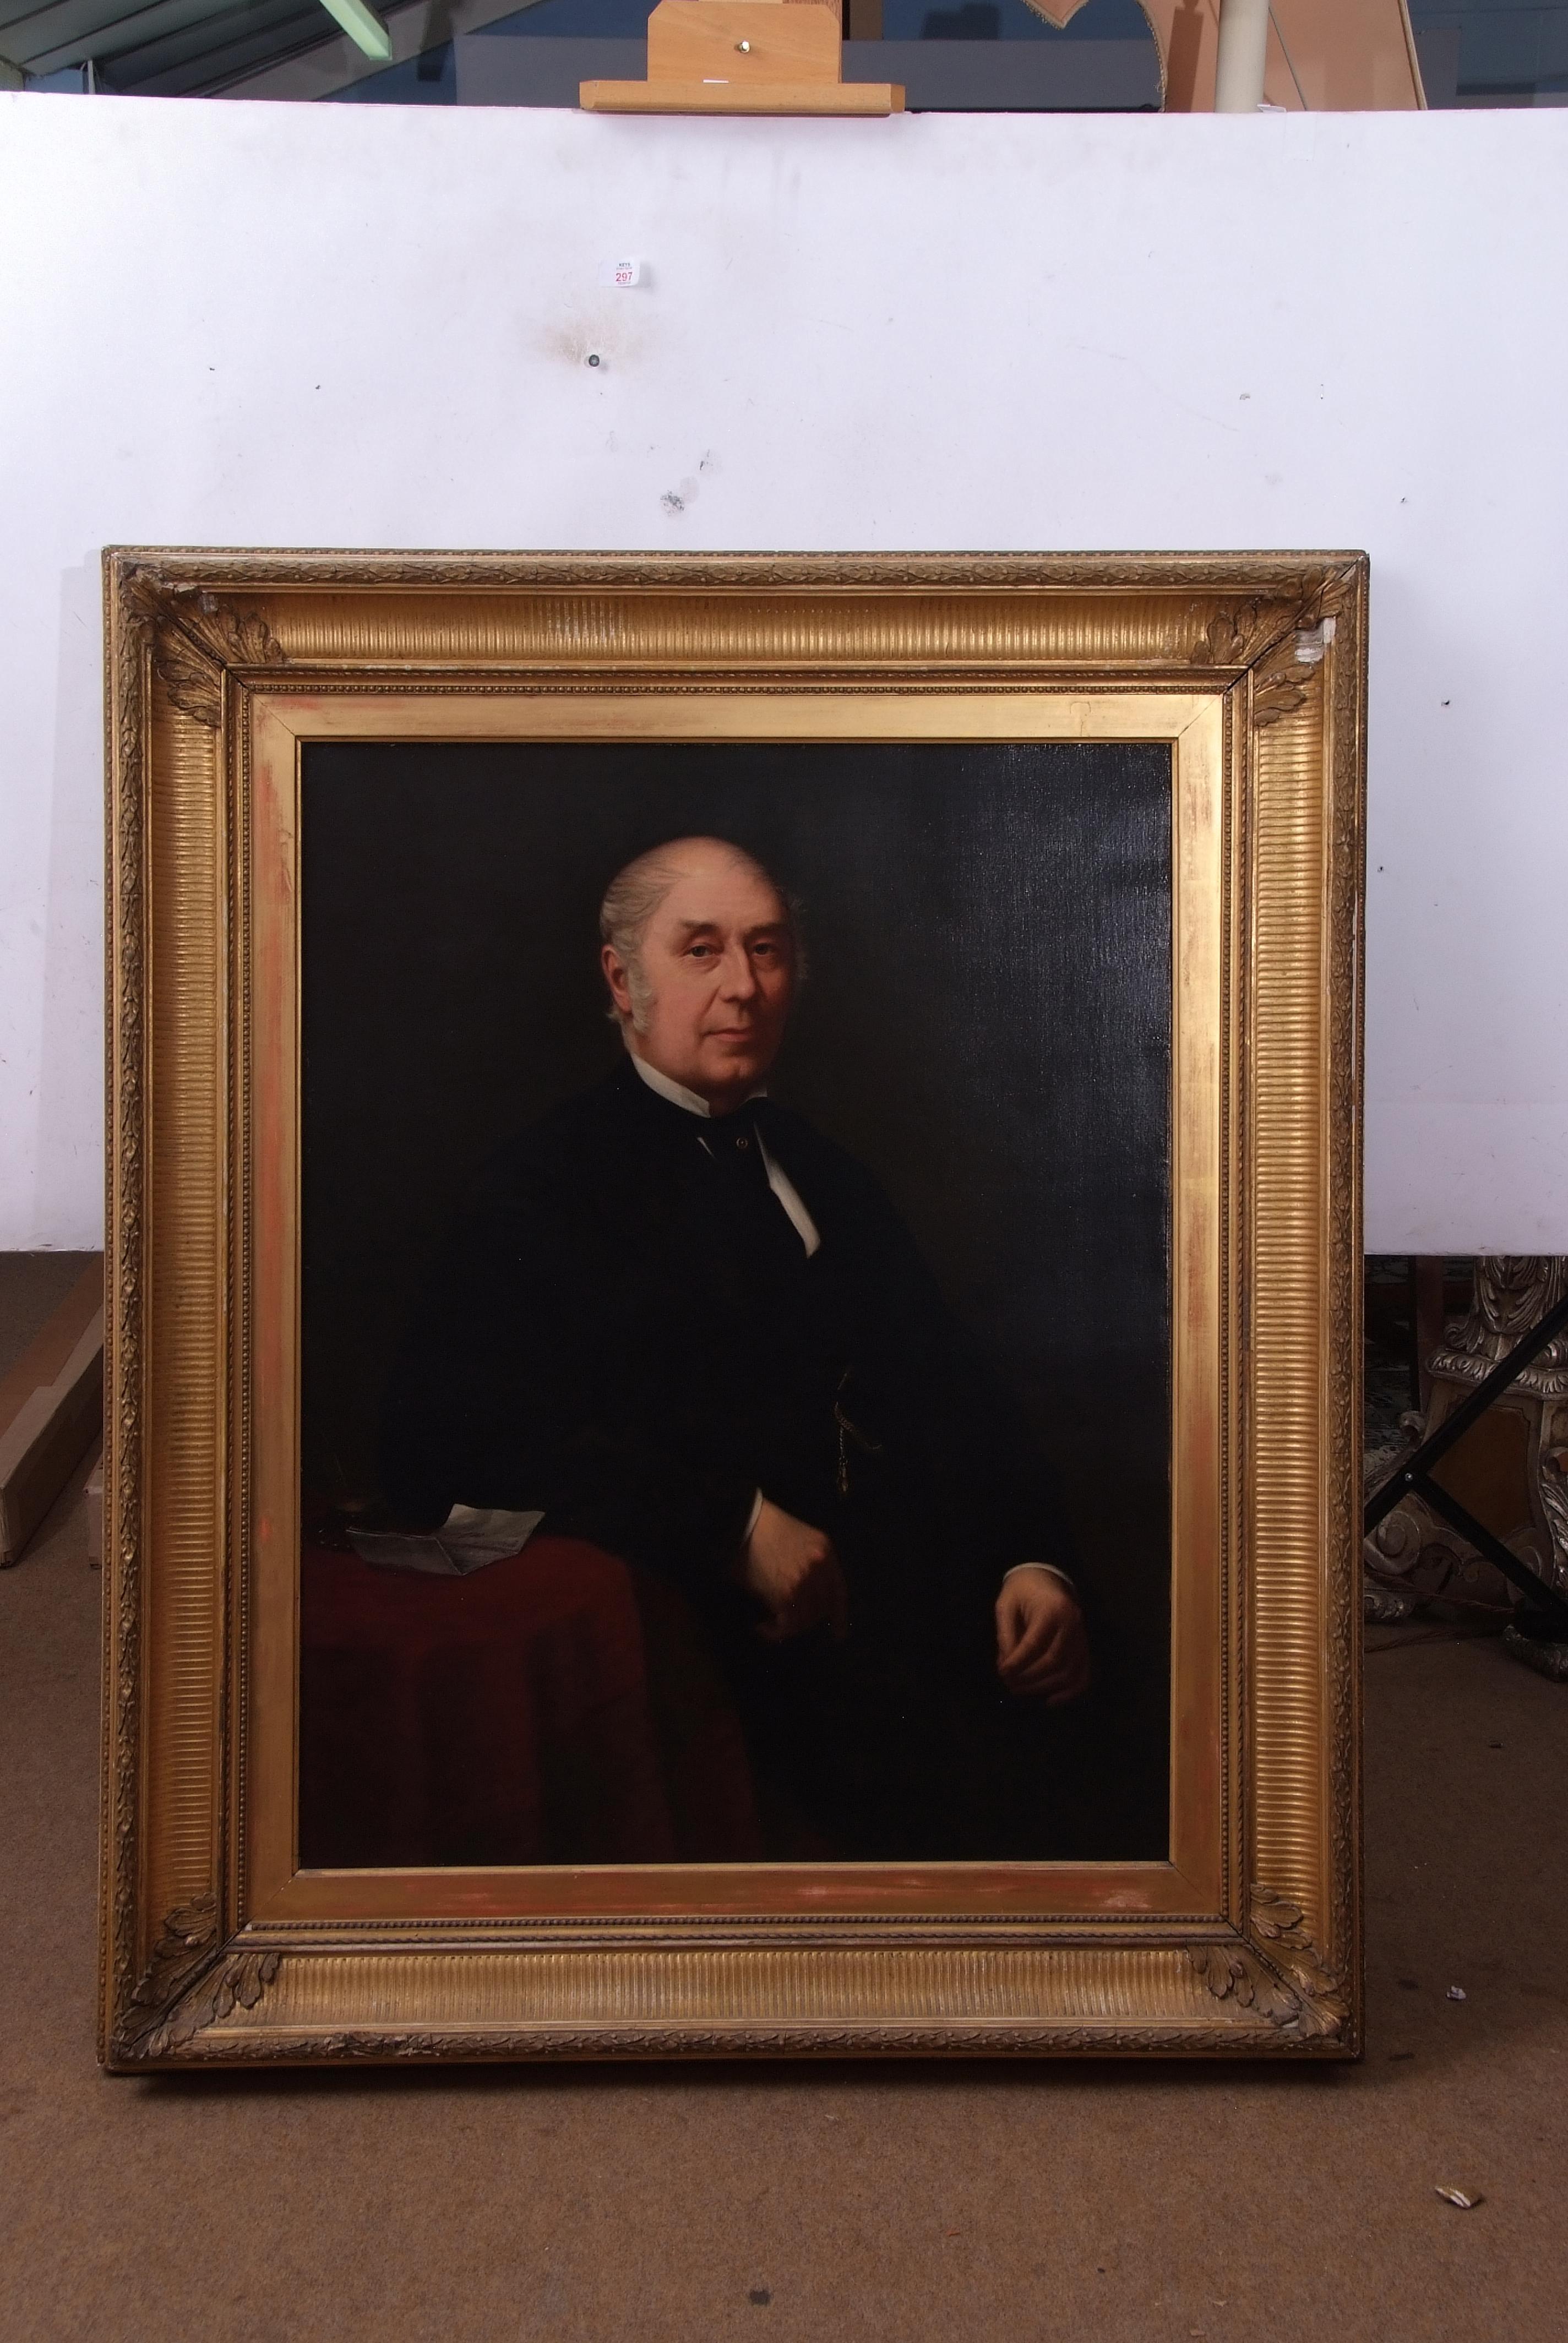 English School (19th century), Half-length portrait of a gent wearing black jacket, oil on canvas,